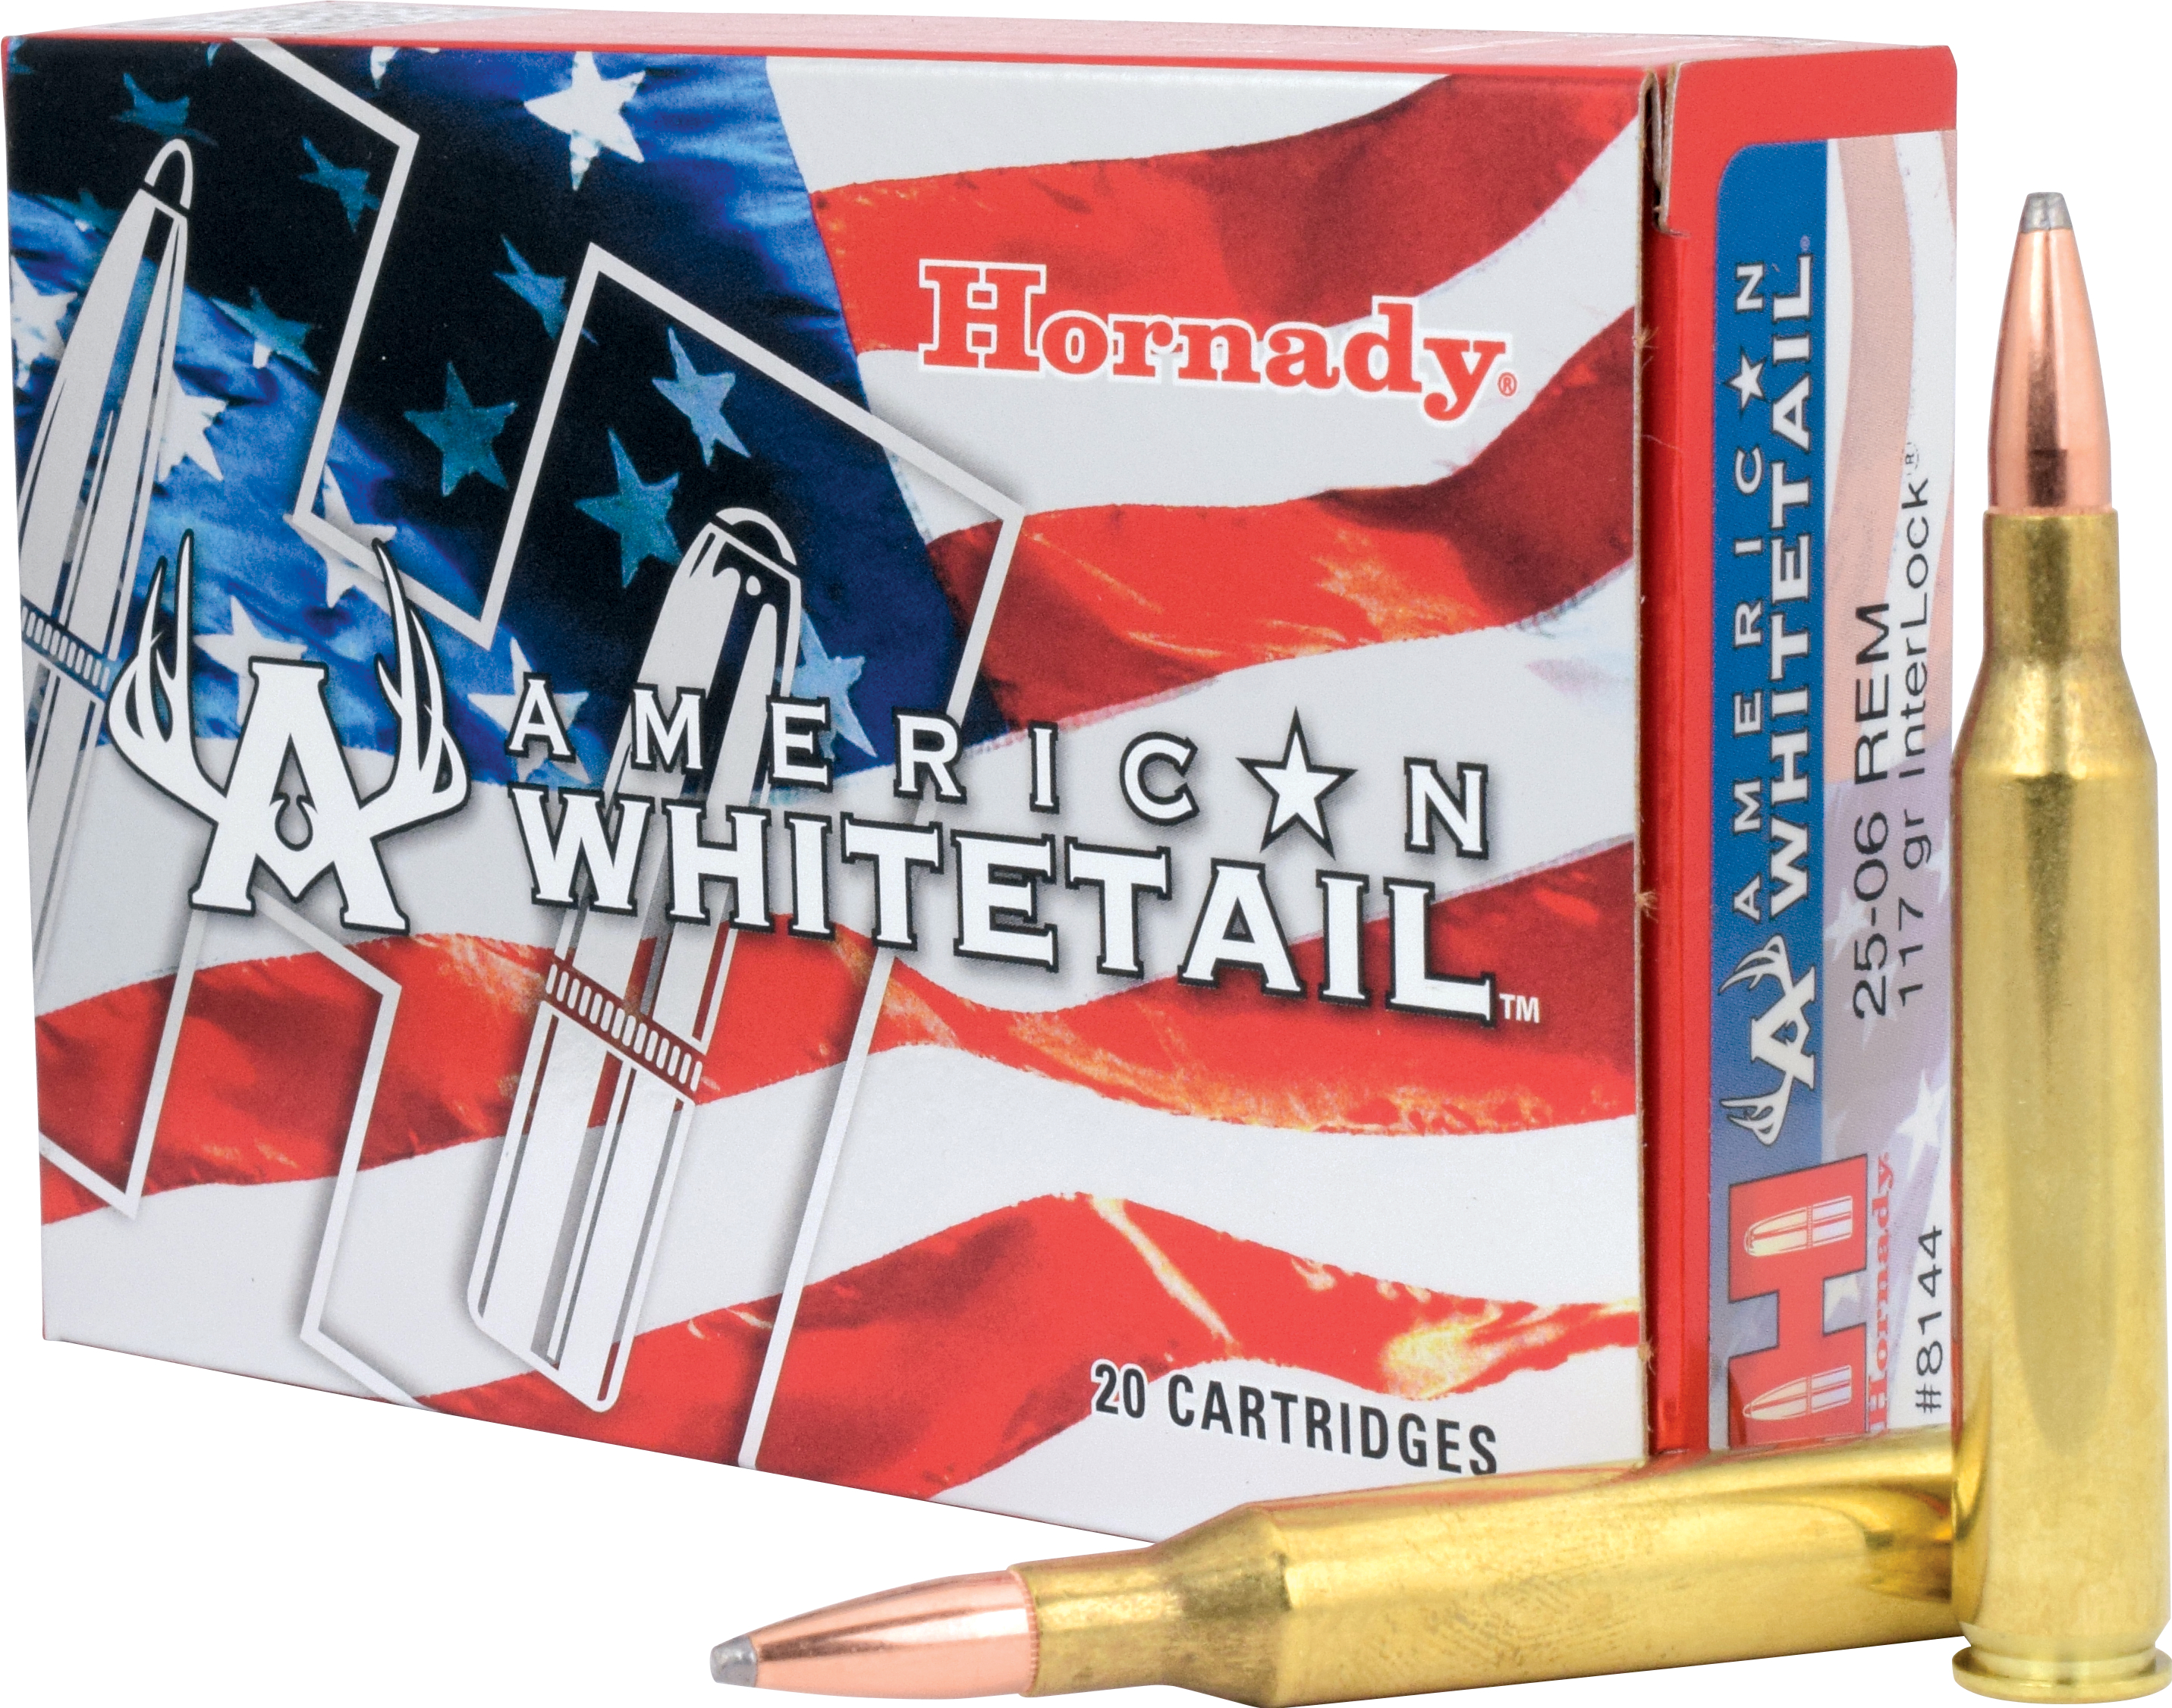 Murdoch's – Hornady -  25-06 Rem 117 Grain InterLock BTSP American  Whitetail Ammo